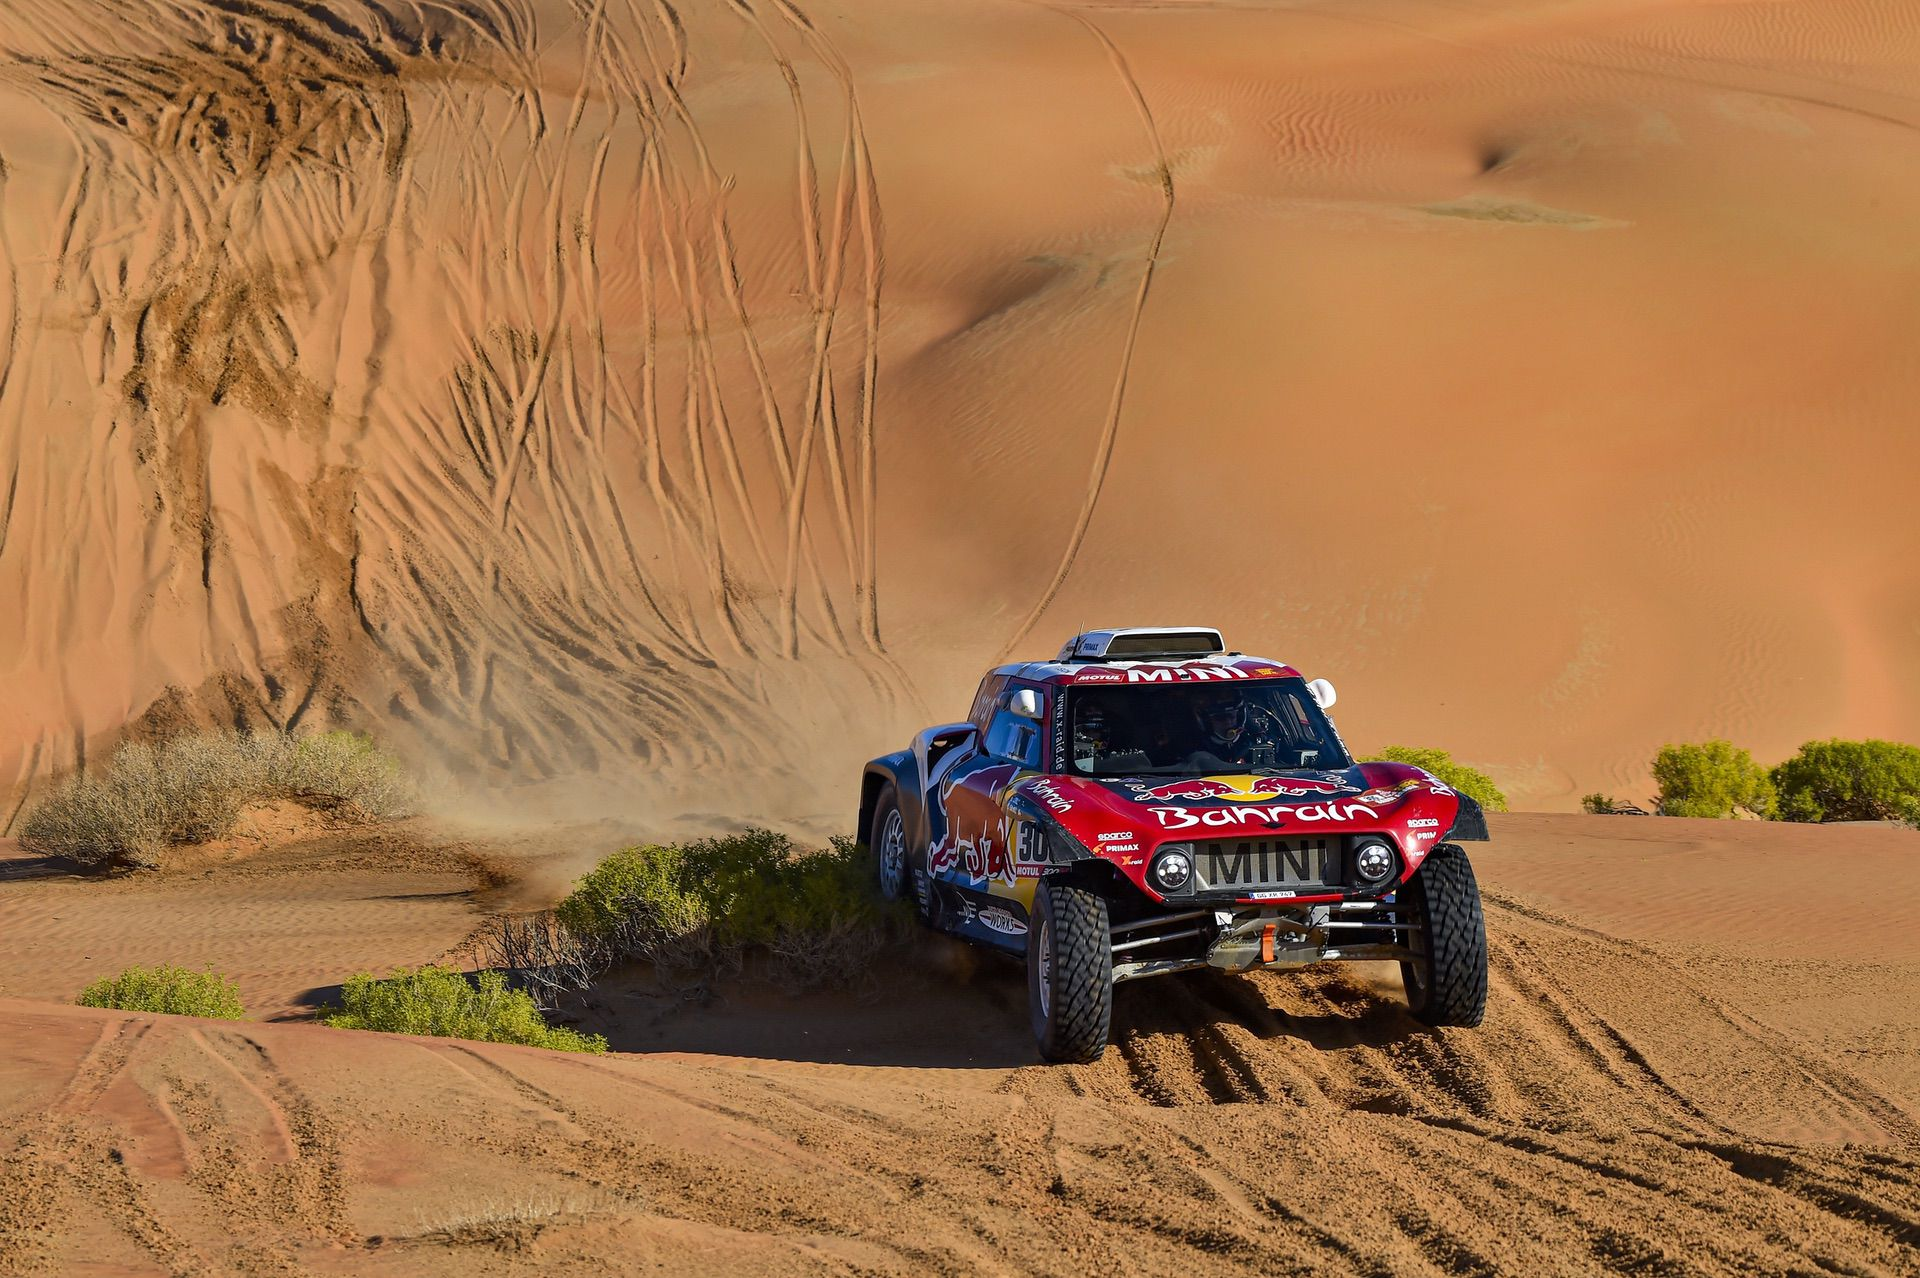 4-й этап ралли Дакар 2021 года стал самым спорным, MINI по-прежнему лидирует